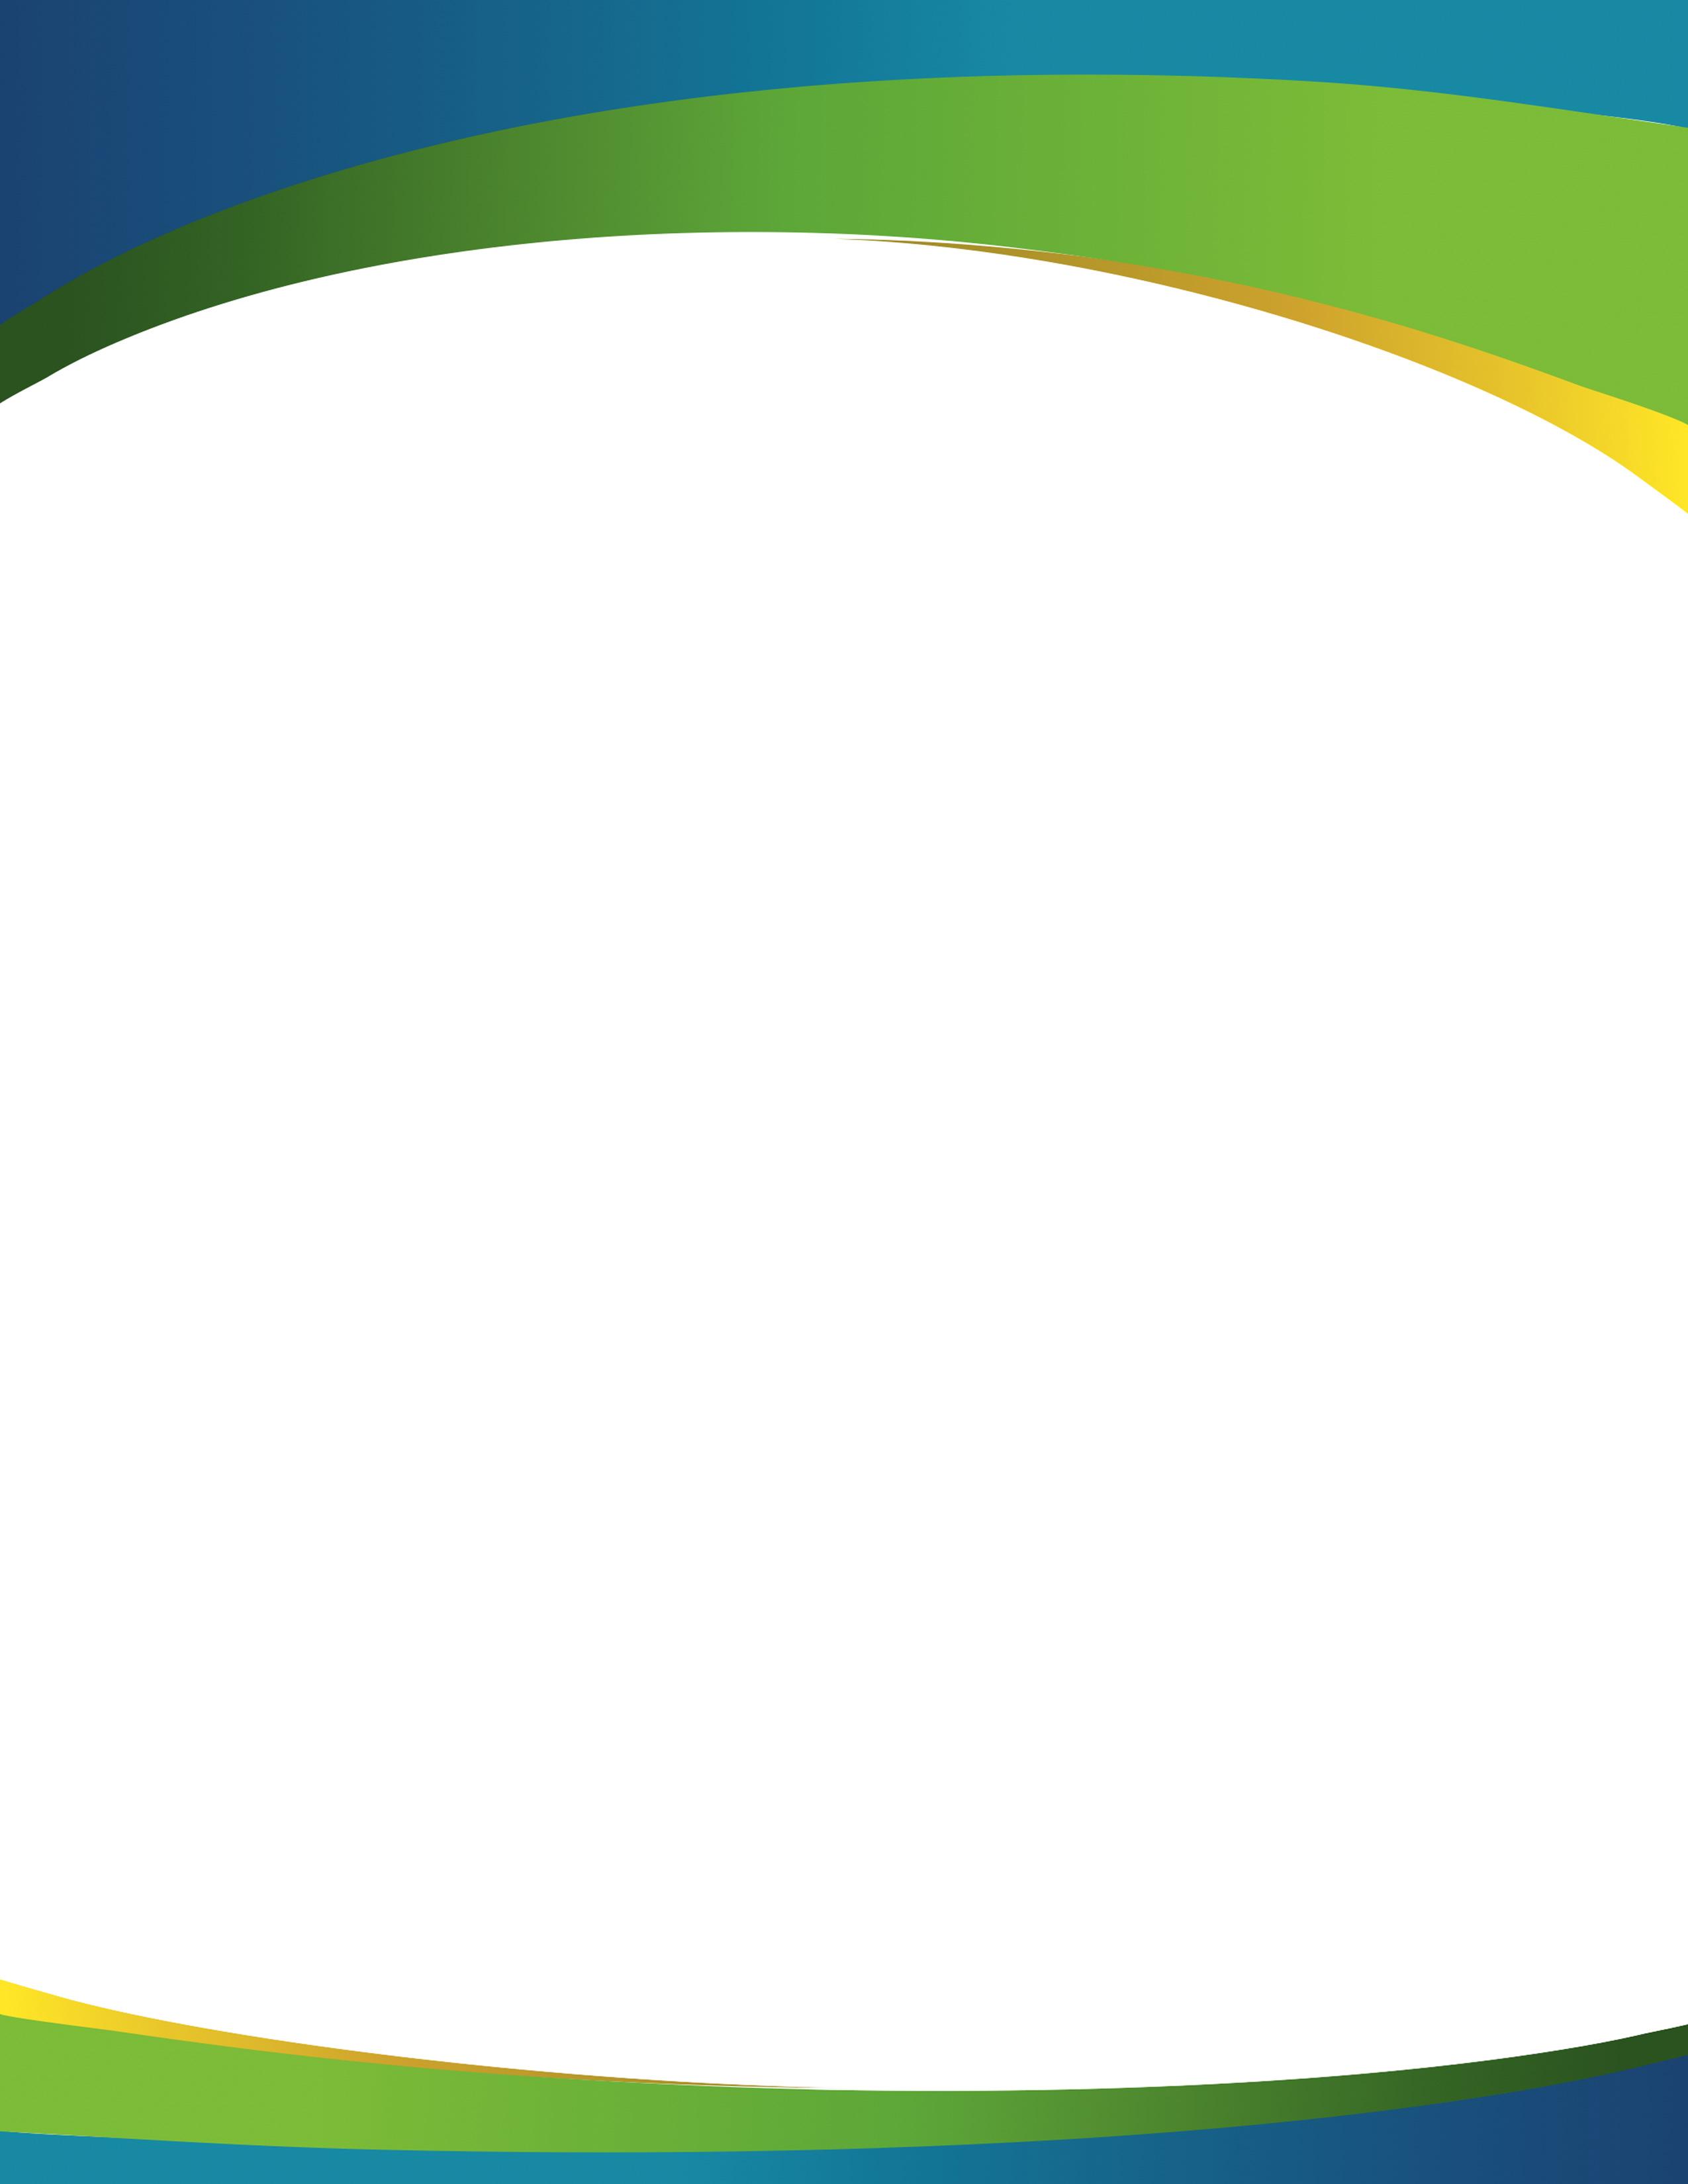 Green Business Poster Template Design